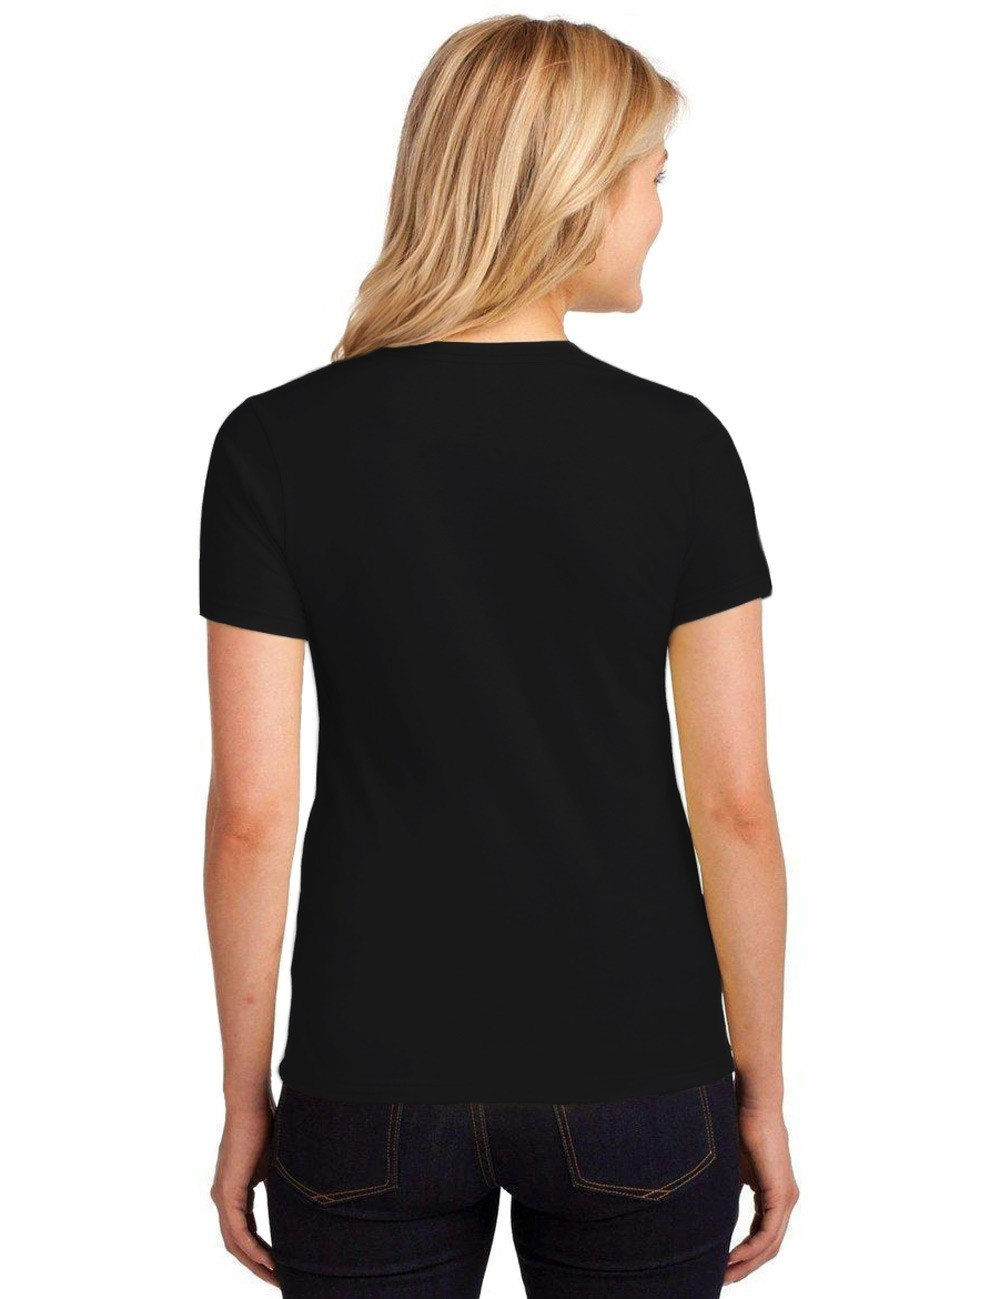 Camiseta Feminina T-Shirt Universitária Faculdade Medicina